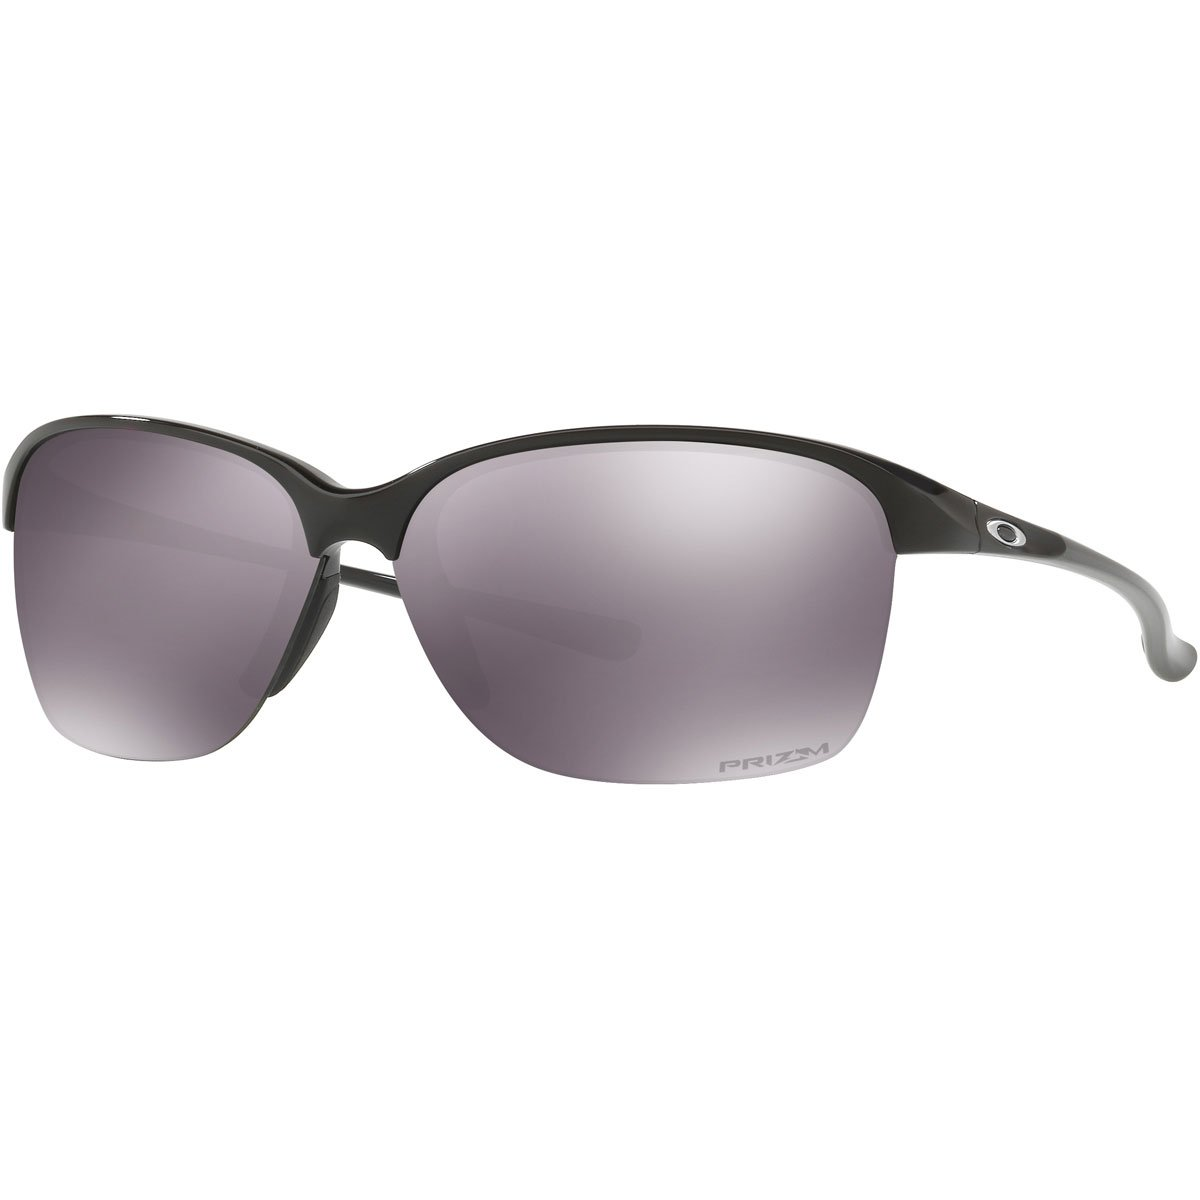 Oakley Women's Unstoppable Rectangular Sunglasses, Polished Black, 65 mm